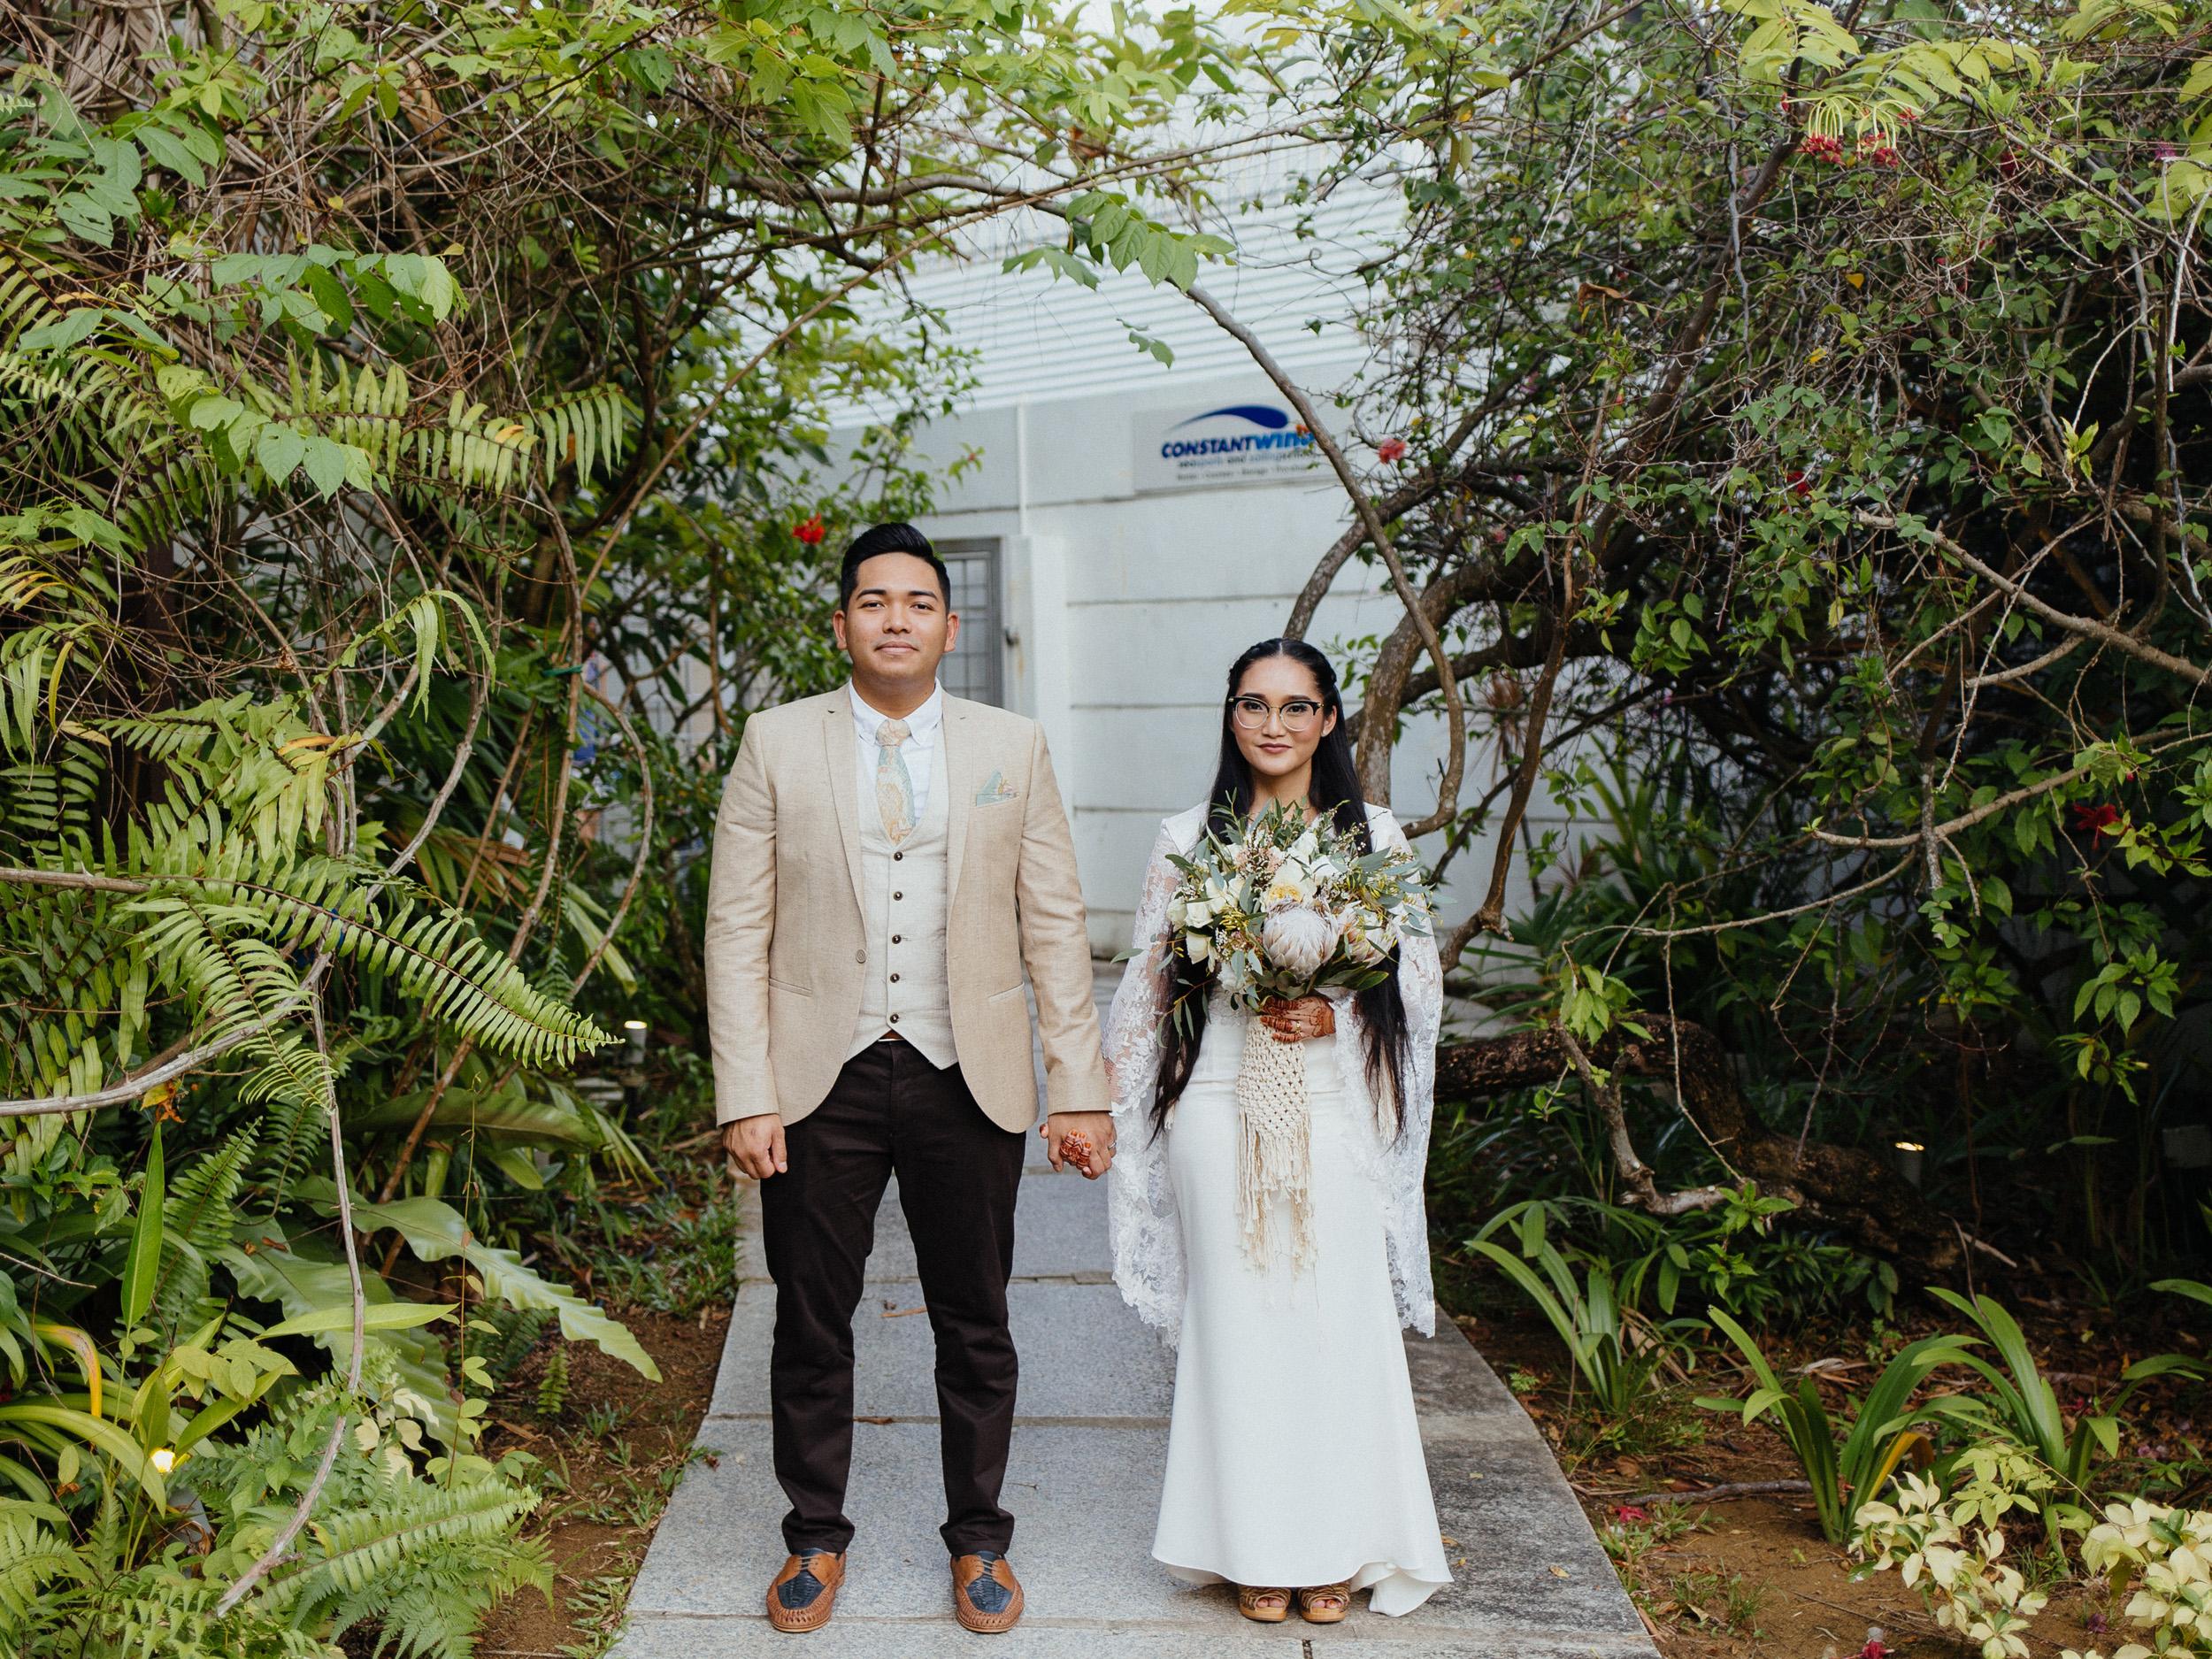 singapore-wedding-photographer-photography-wmt2017-152.jpg